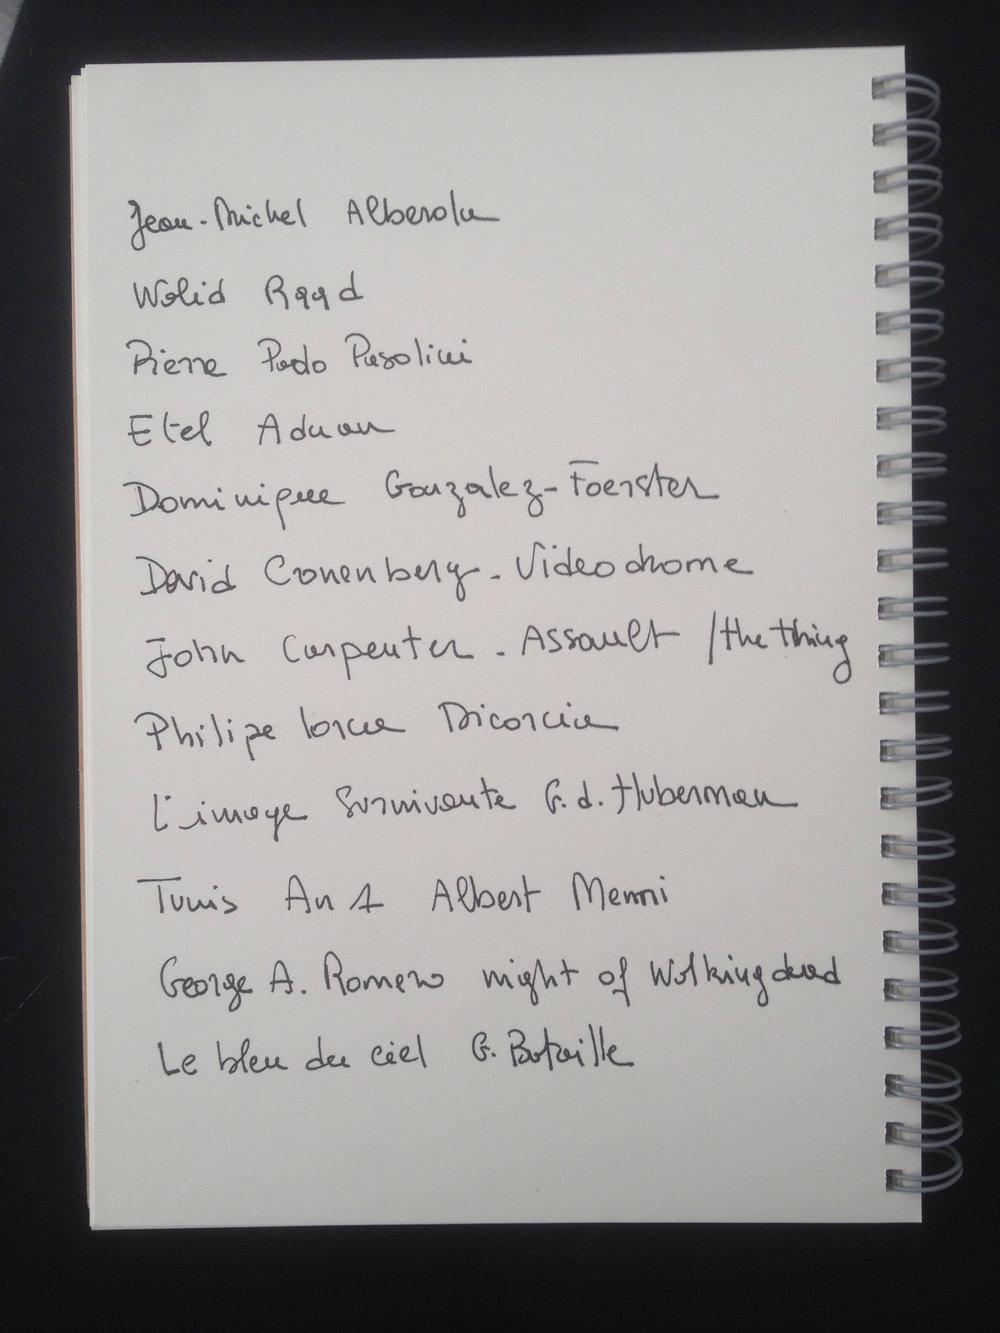 Yesmine Ben Khelil's quick list of influences